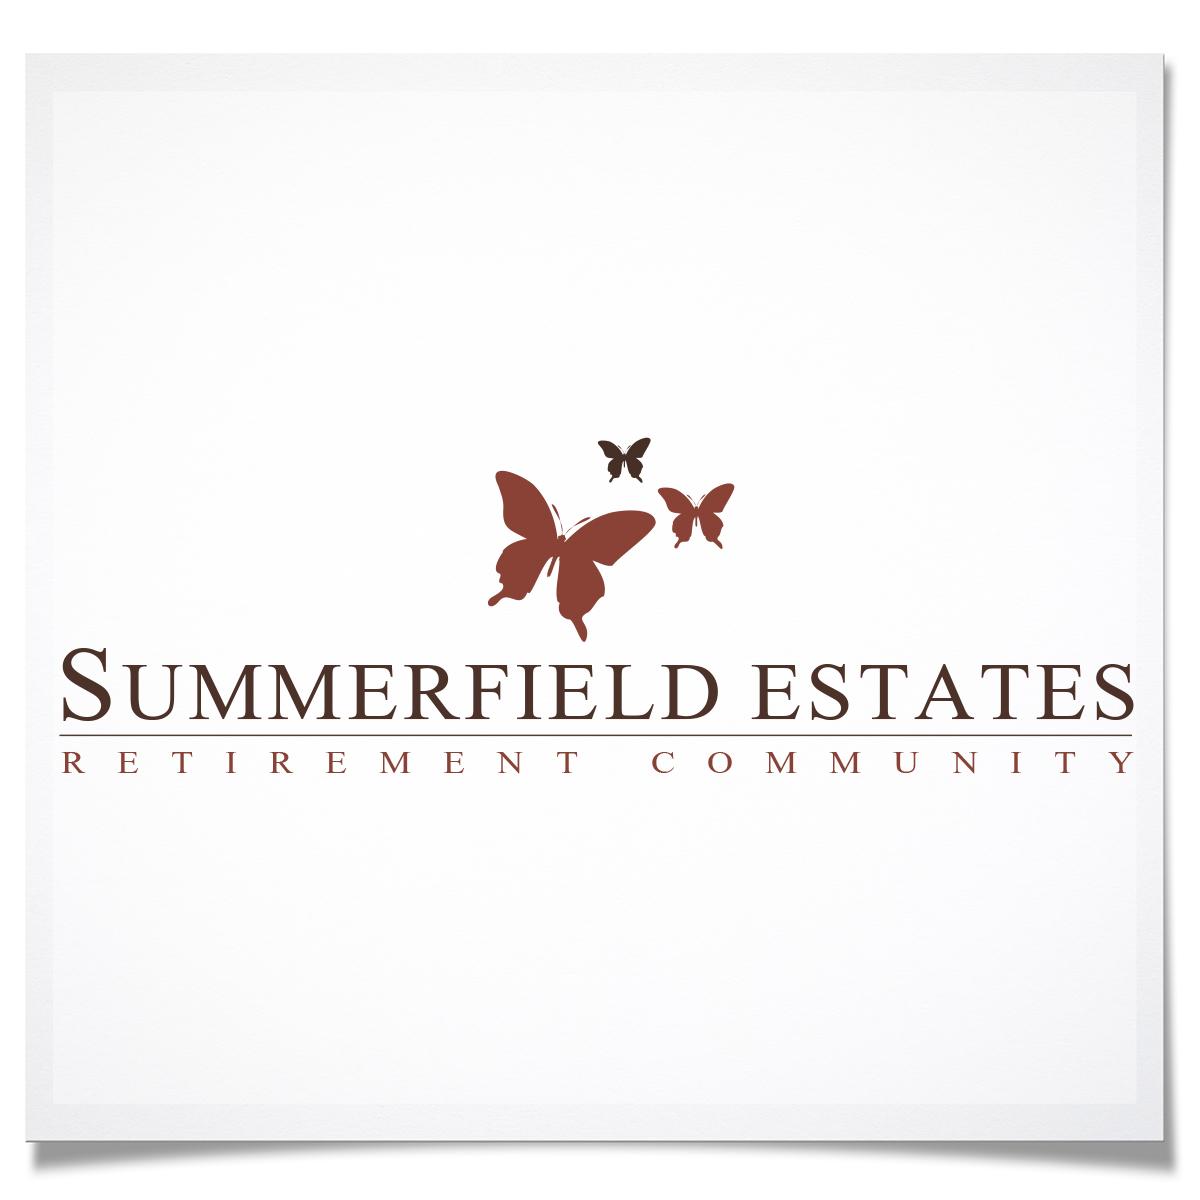 Summerfield Estates Retirement Community - Tigard, OR - Retirement Communities